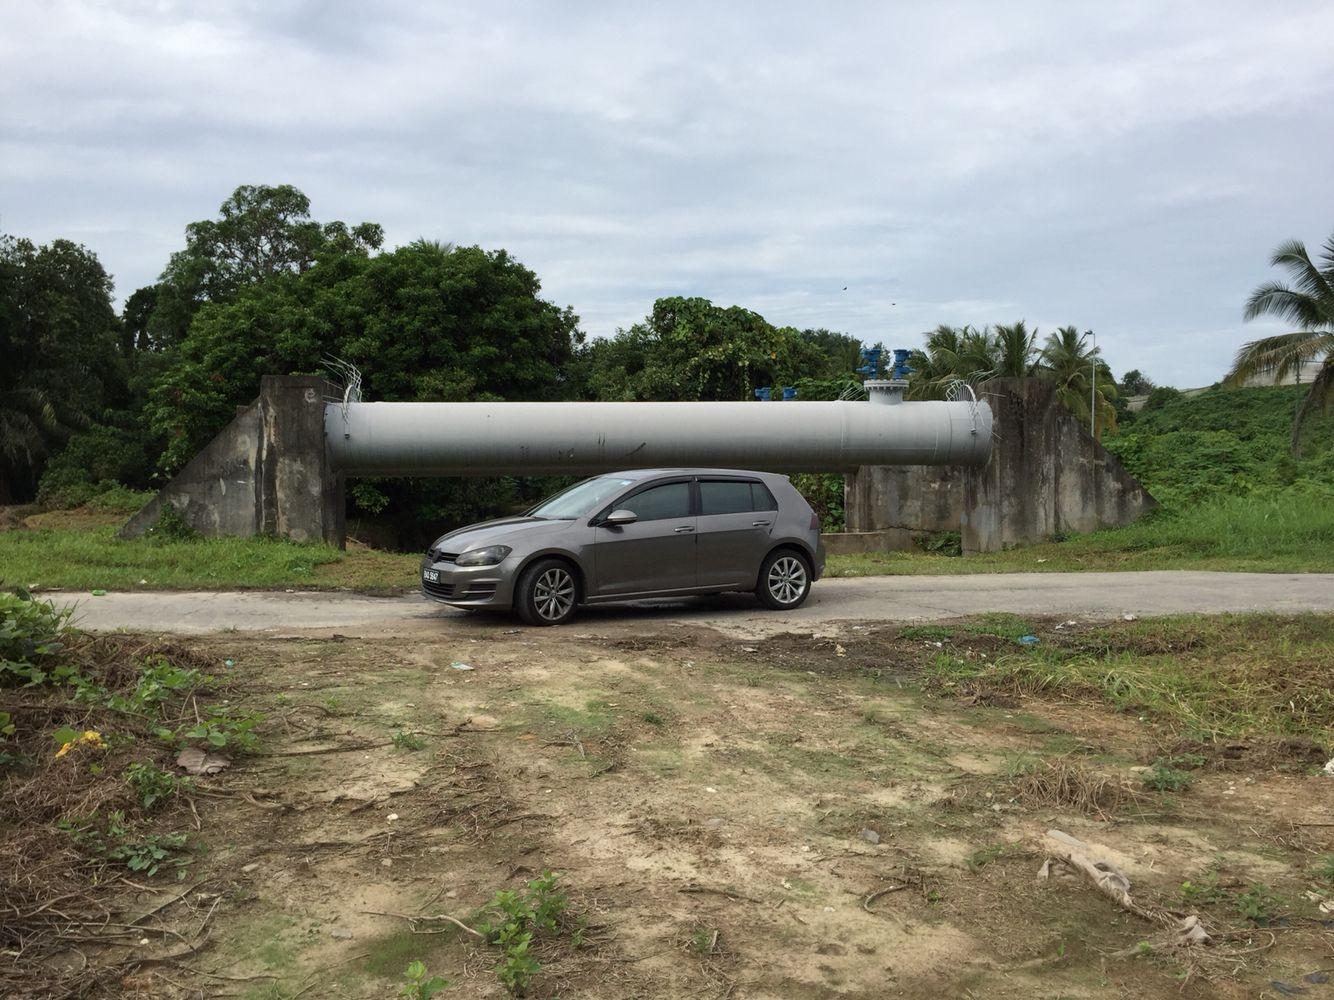 VW Golf 1 2 TSI Limestone Grey Metallic